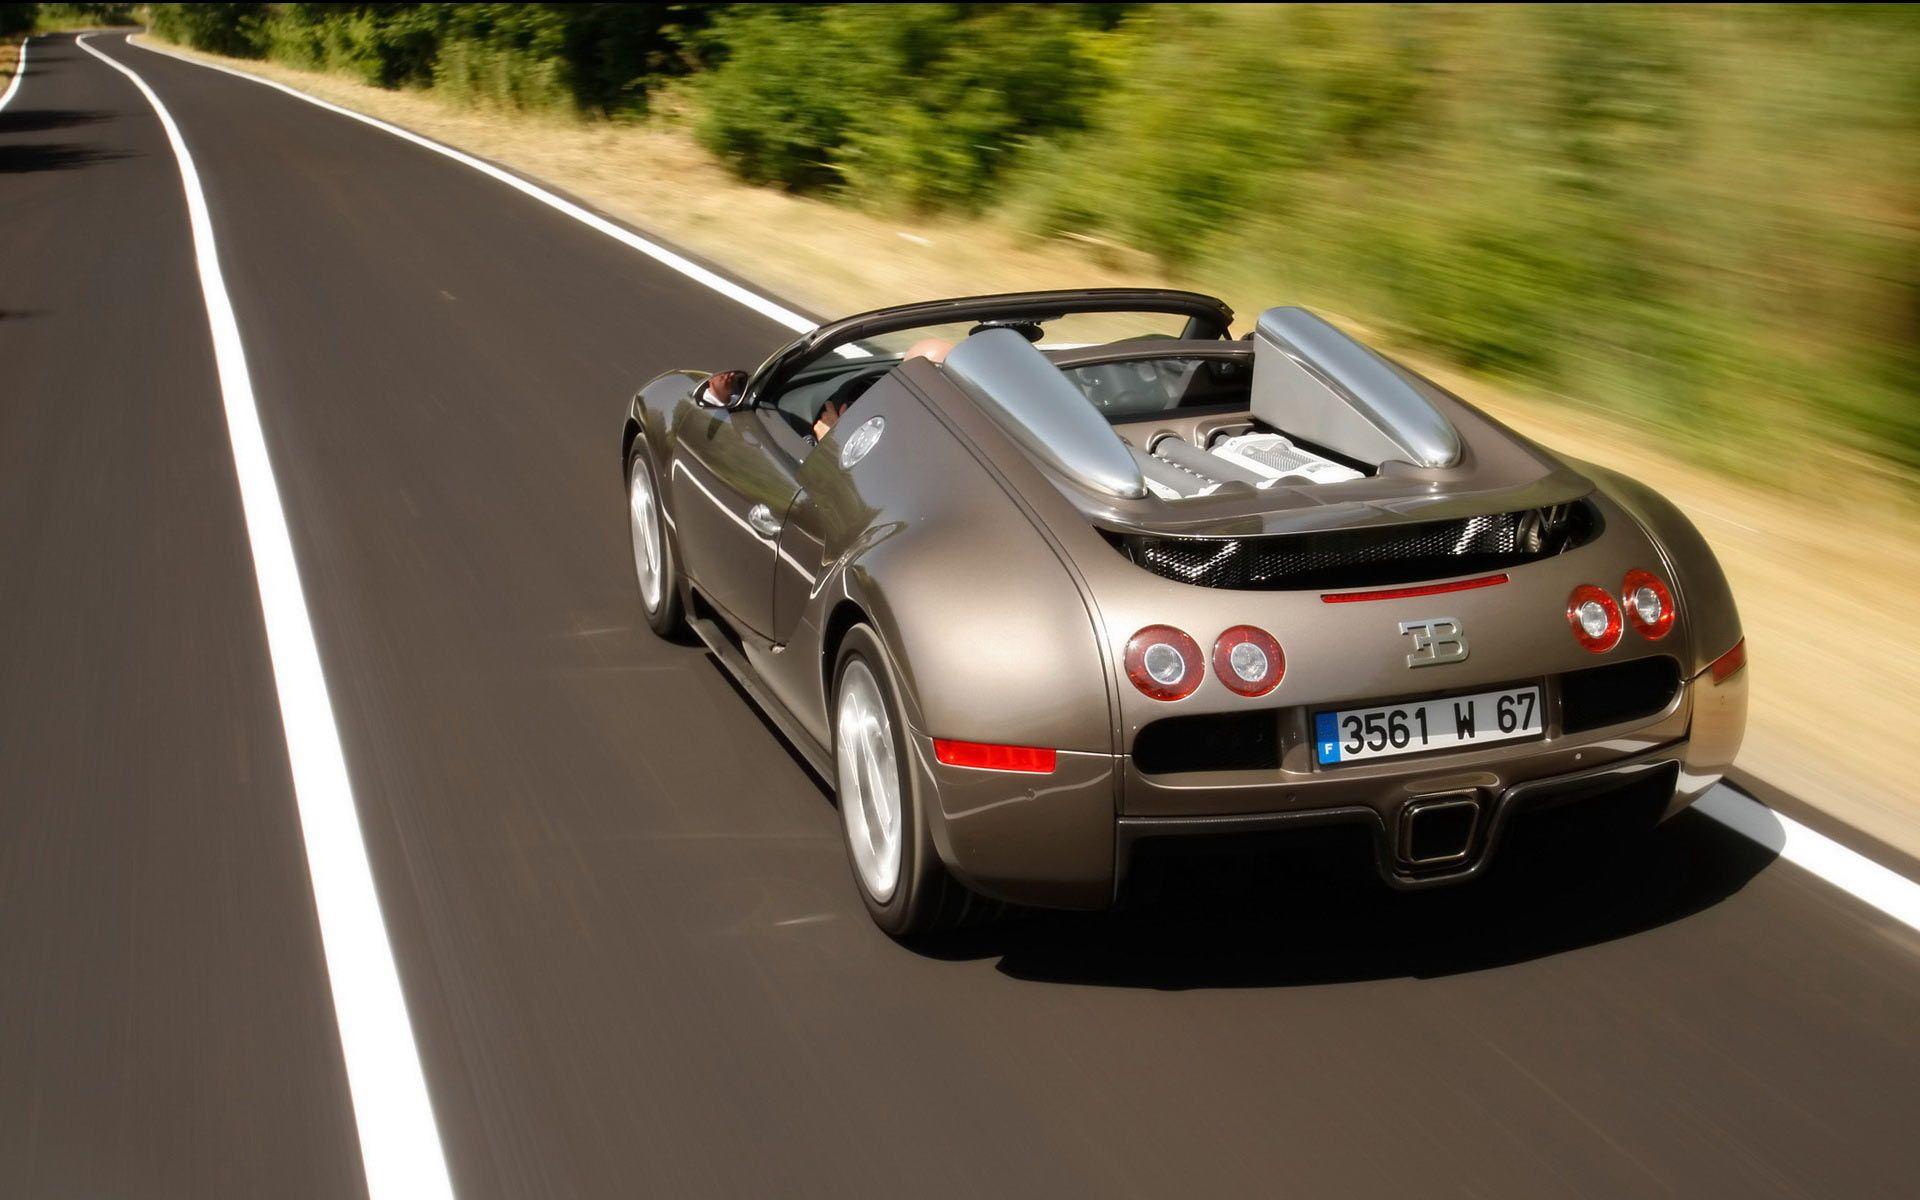 Aircraft Bugatti Sports Cars Hd Wallpaper Bugatti Veyron Bugatti Sports Car Wallpaper